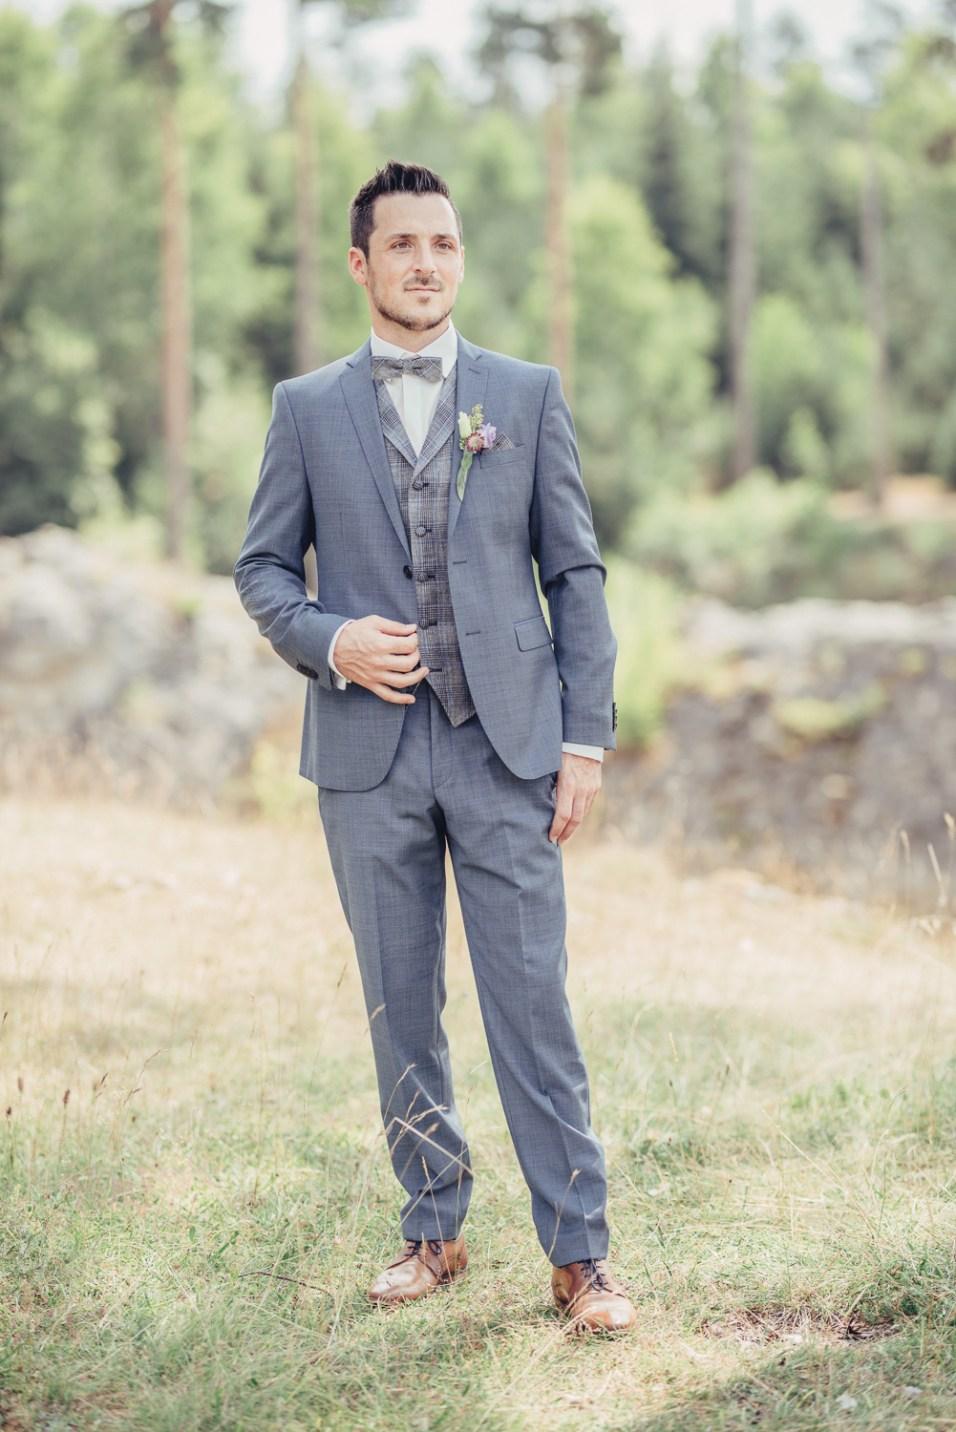 weddingaugust2018luminoxx723445-90